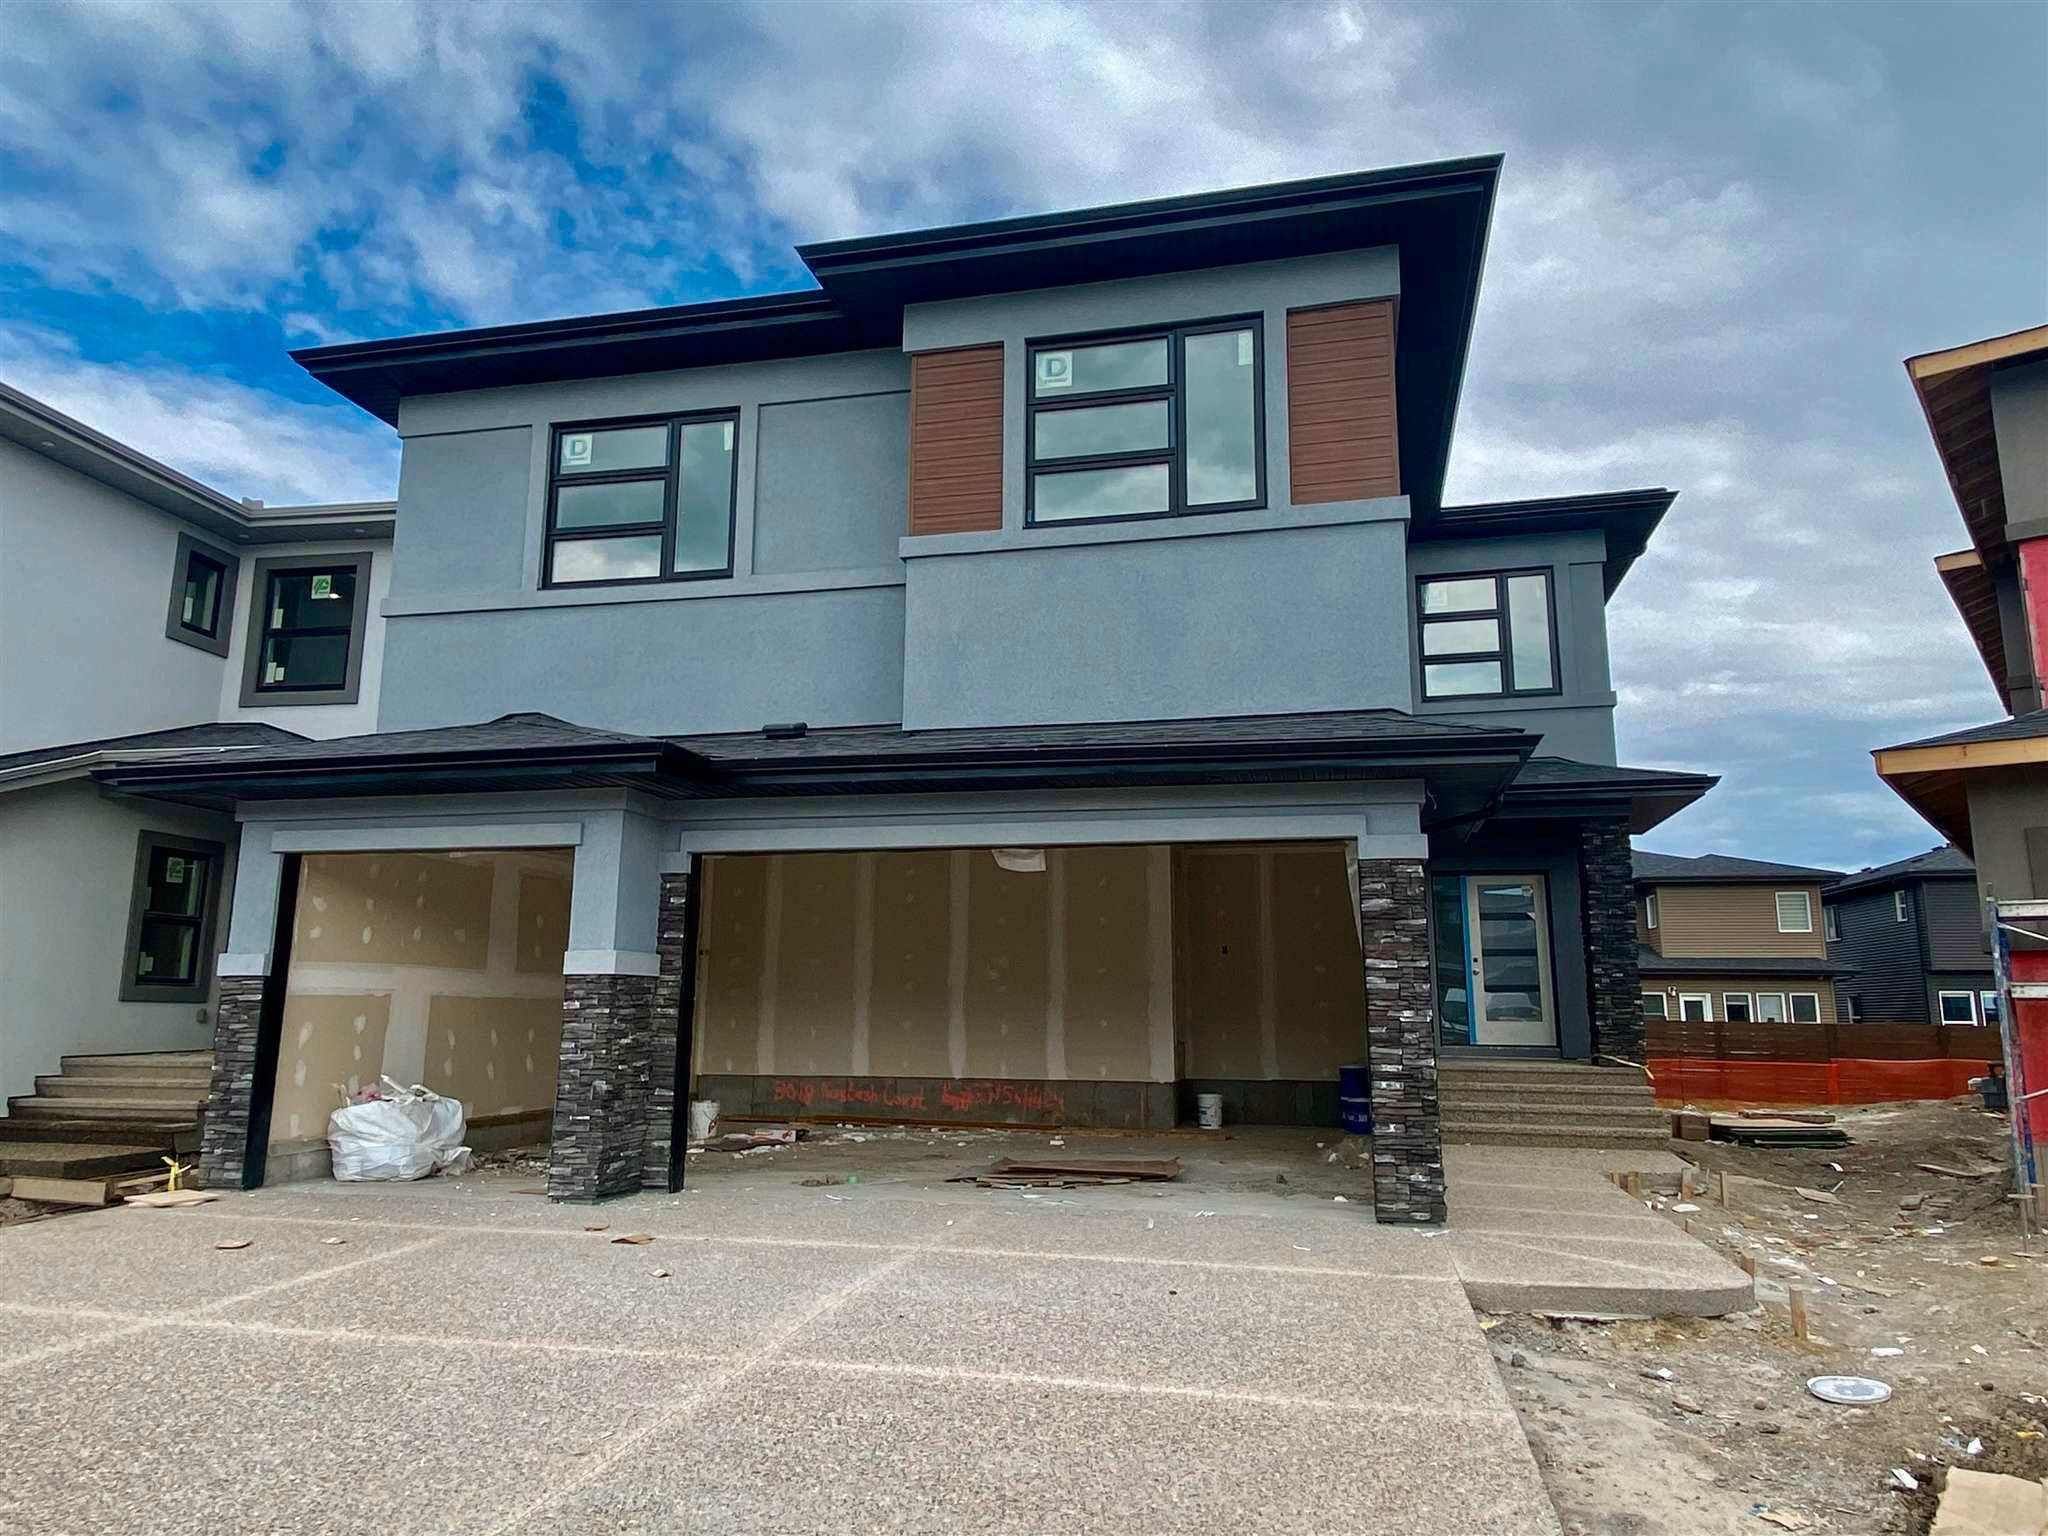 Main Photo: 3018 KOSTASH Crest in Edmonton: Zone 56 House for sale : MLS®# E4251524